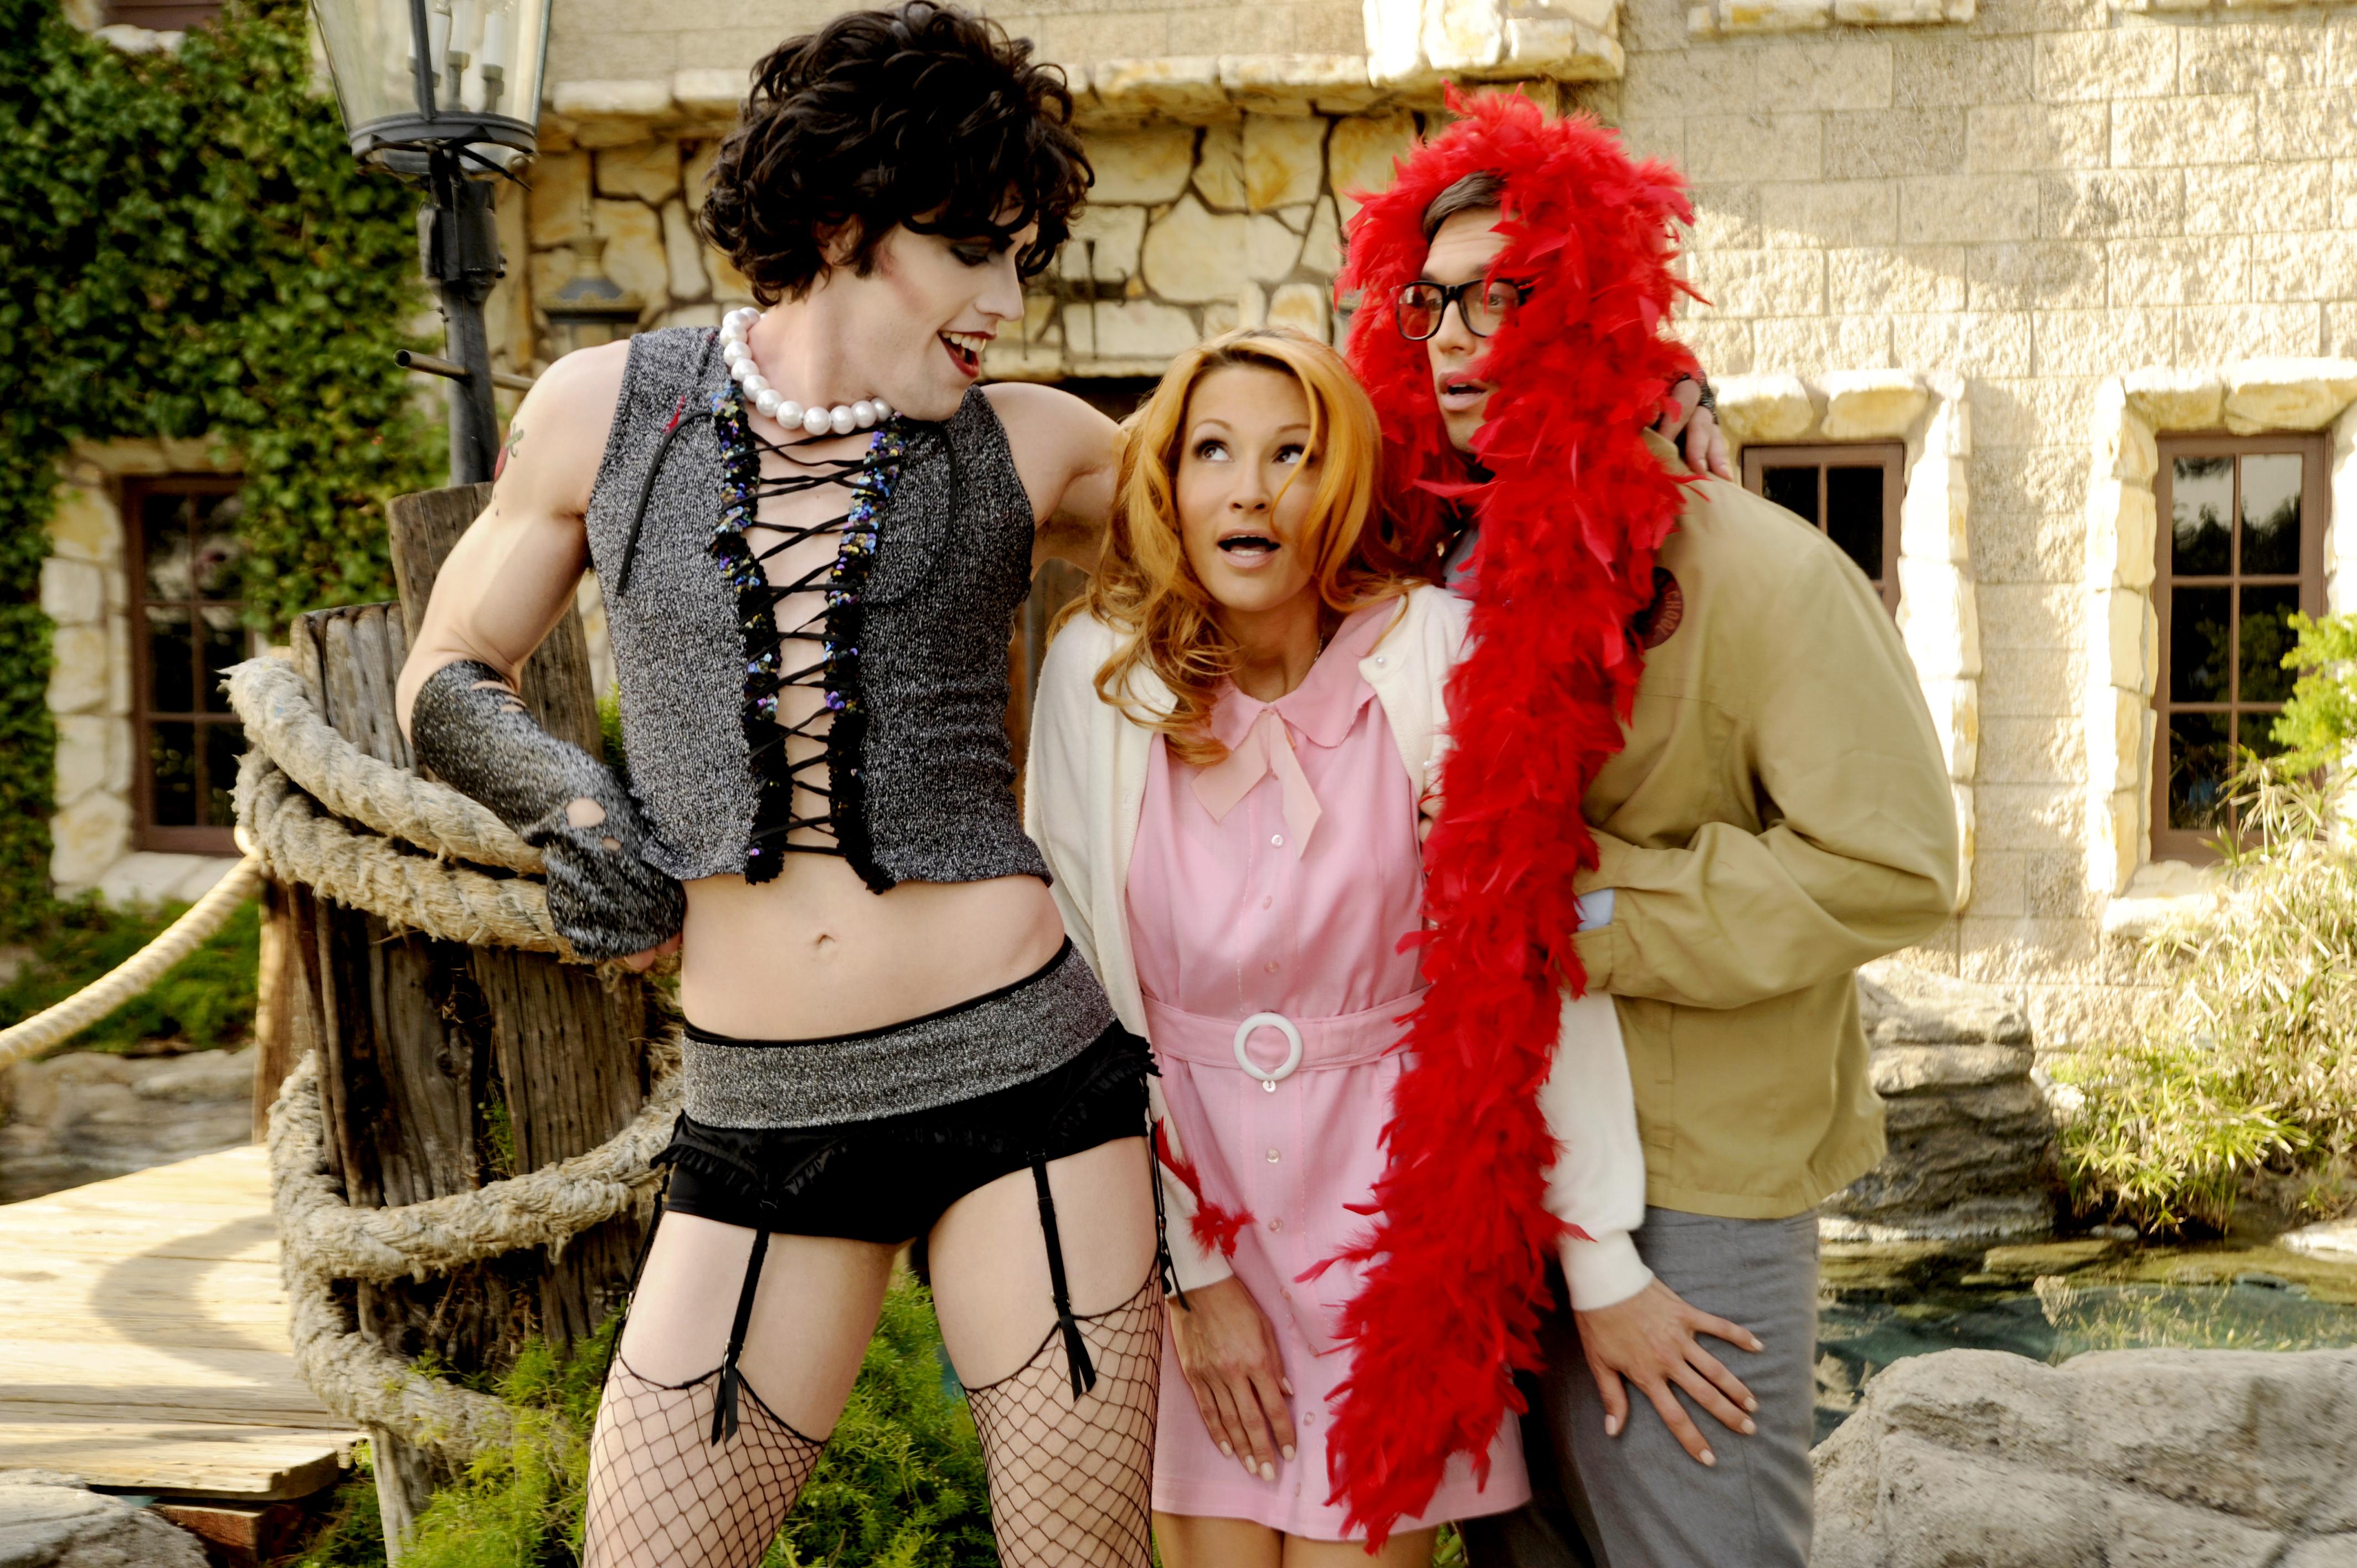 Did rocky horror show porn parody congratulate, what